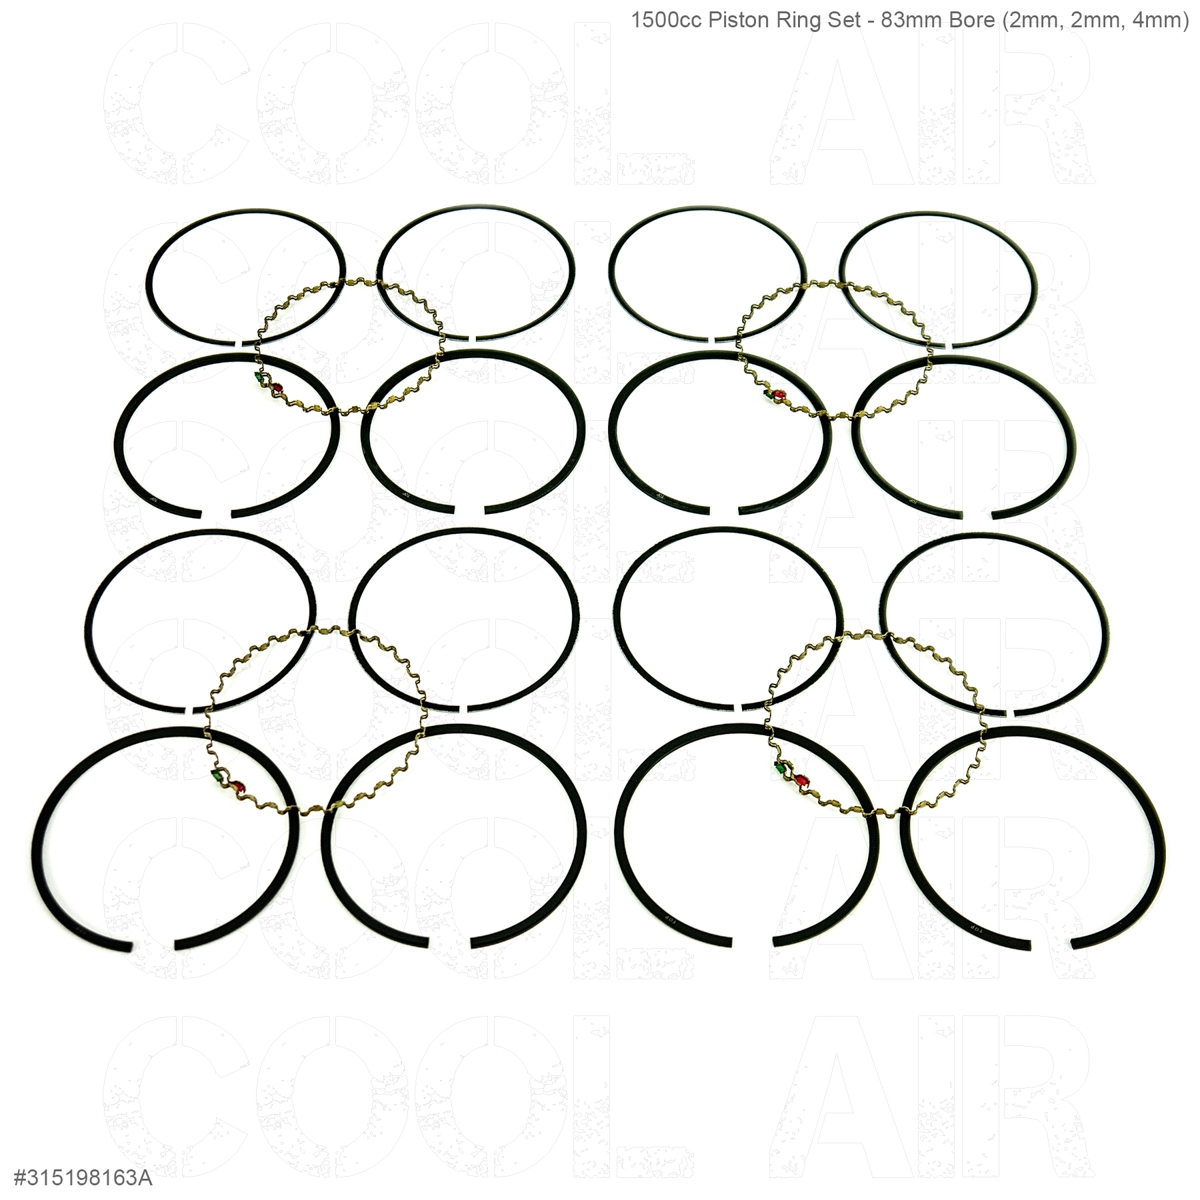 1500cc Piston Ring Set - 83mm Bore (2mm, 2mm, 4mm)